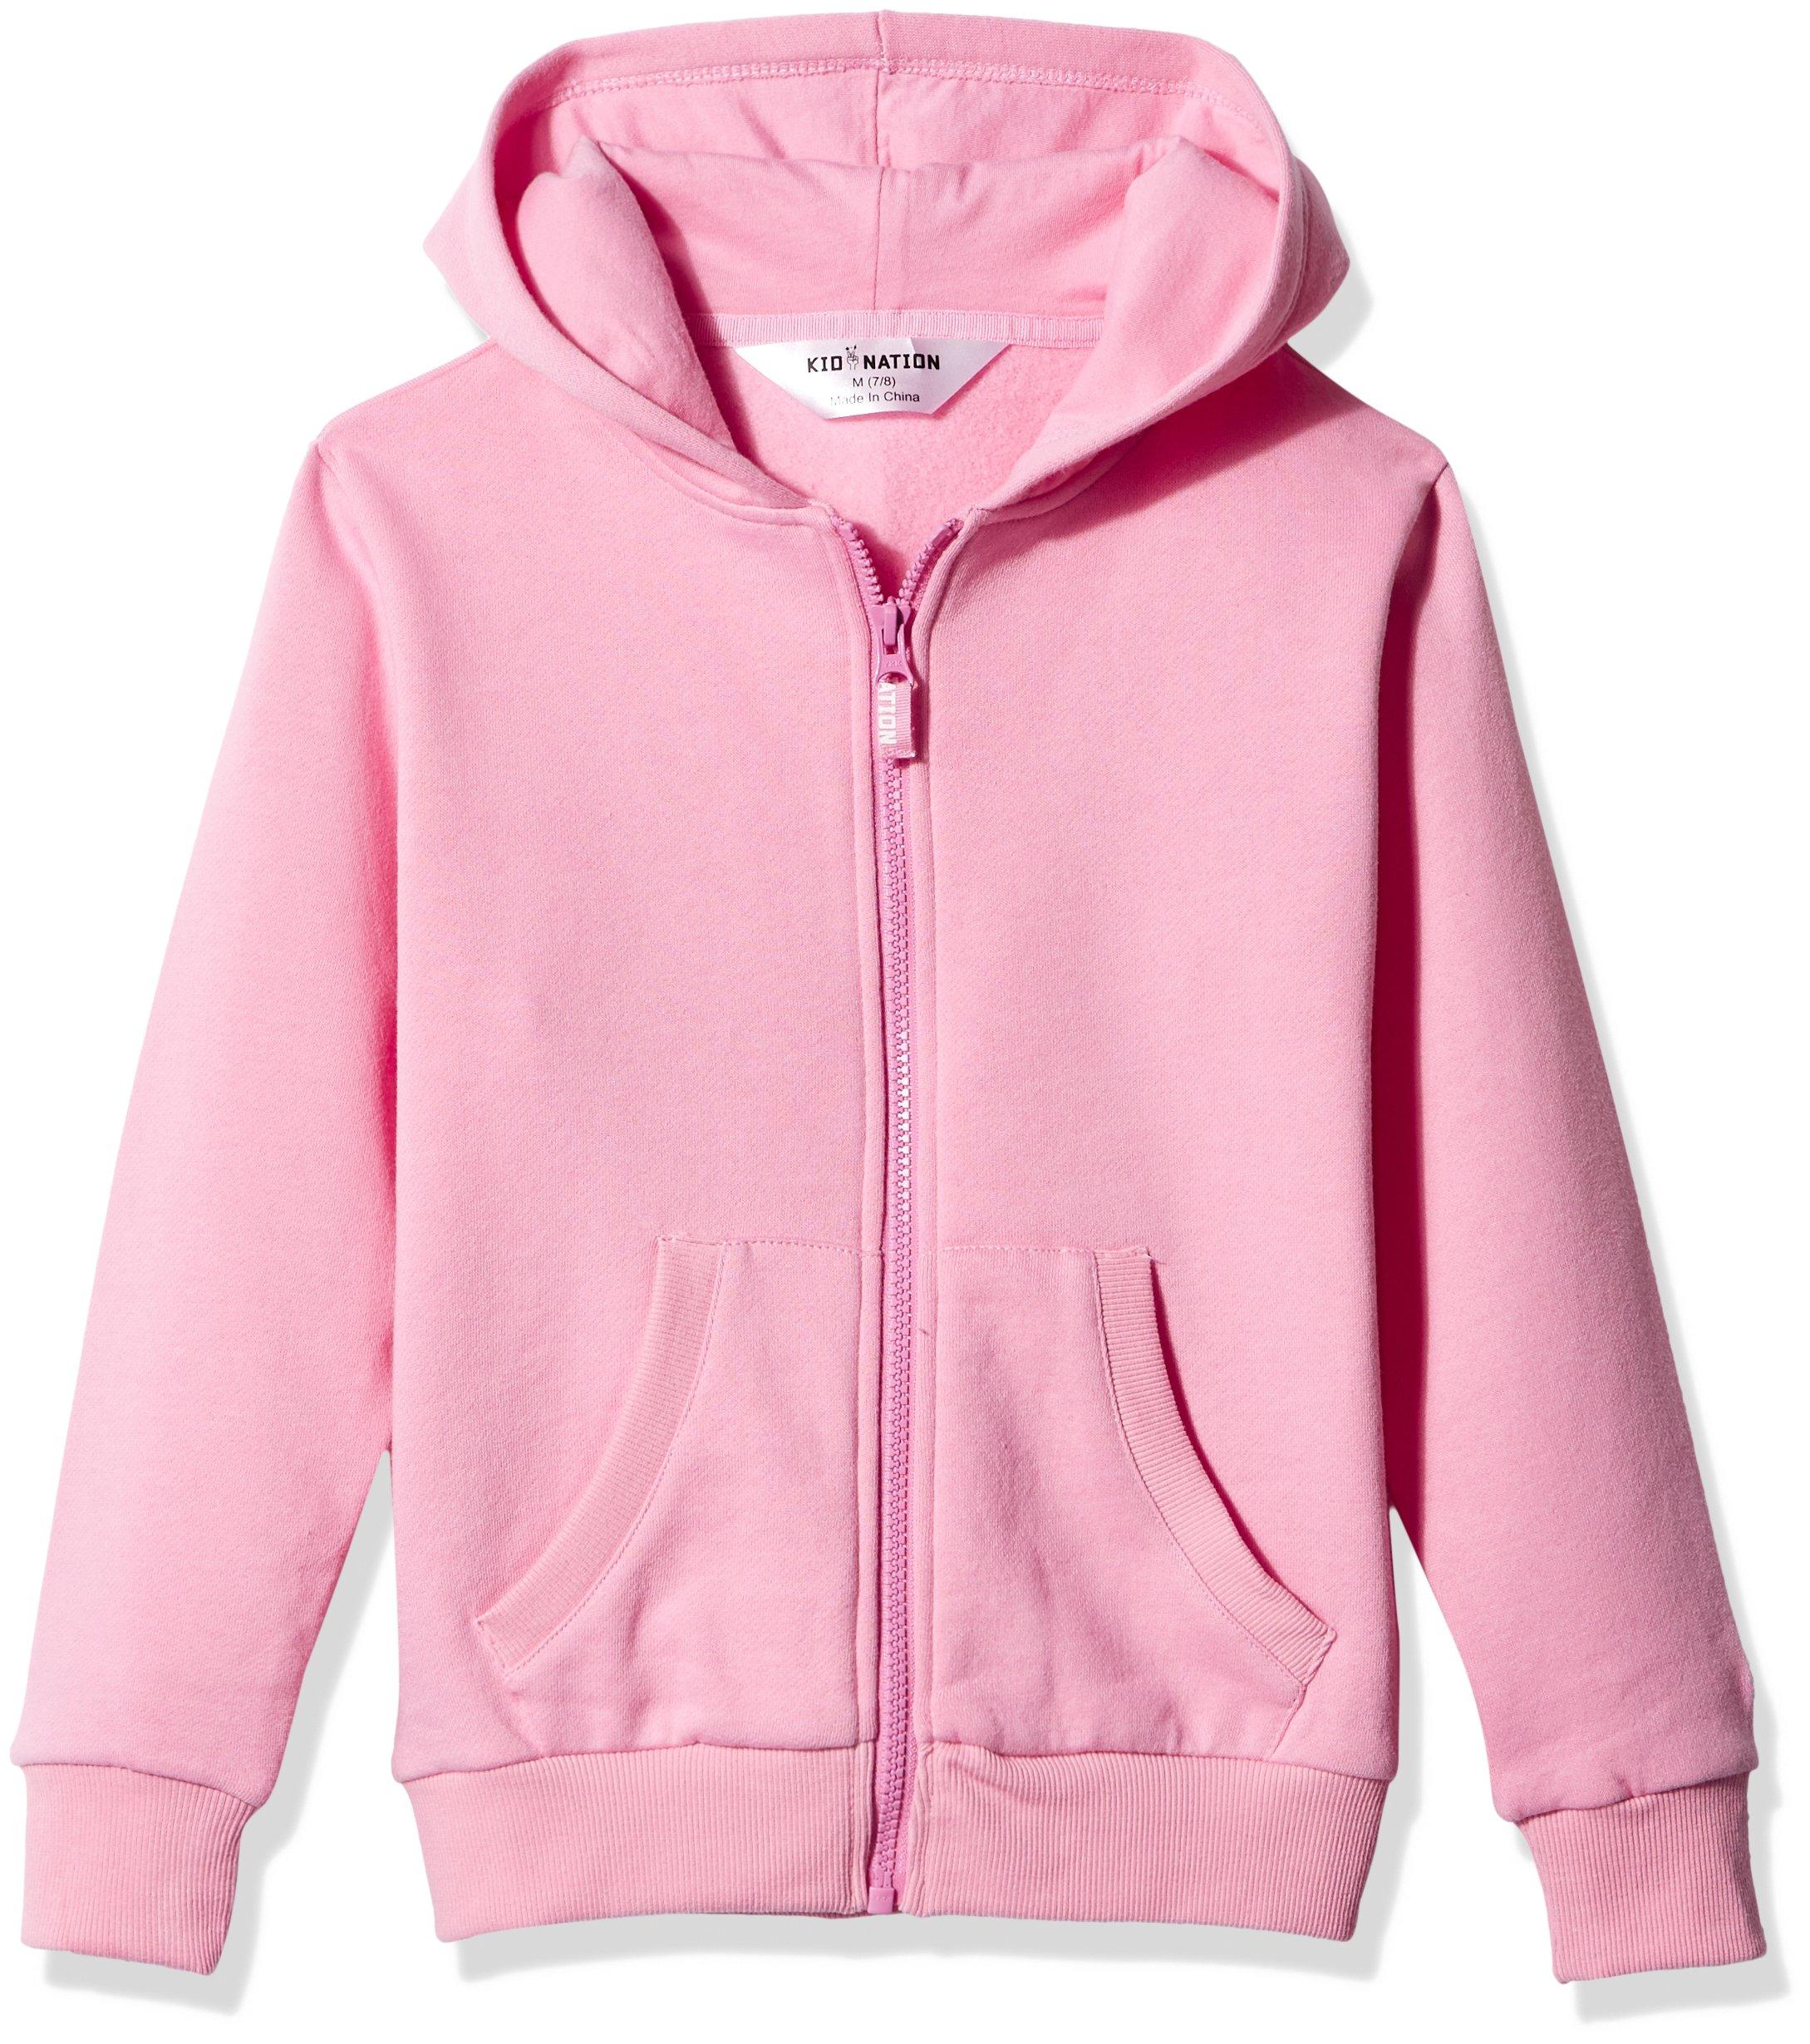 Kid Nation Kids' Brushed Fleece Zip-up Hooded Sweatshirt for Boys Girls L Seashell Pink